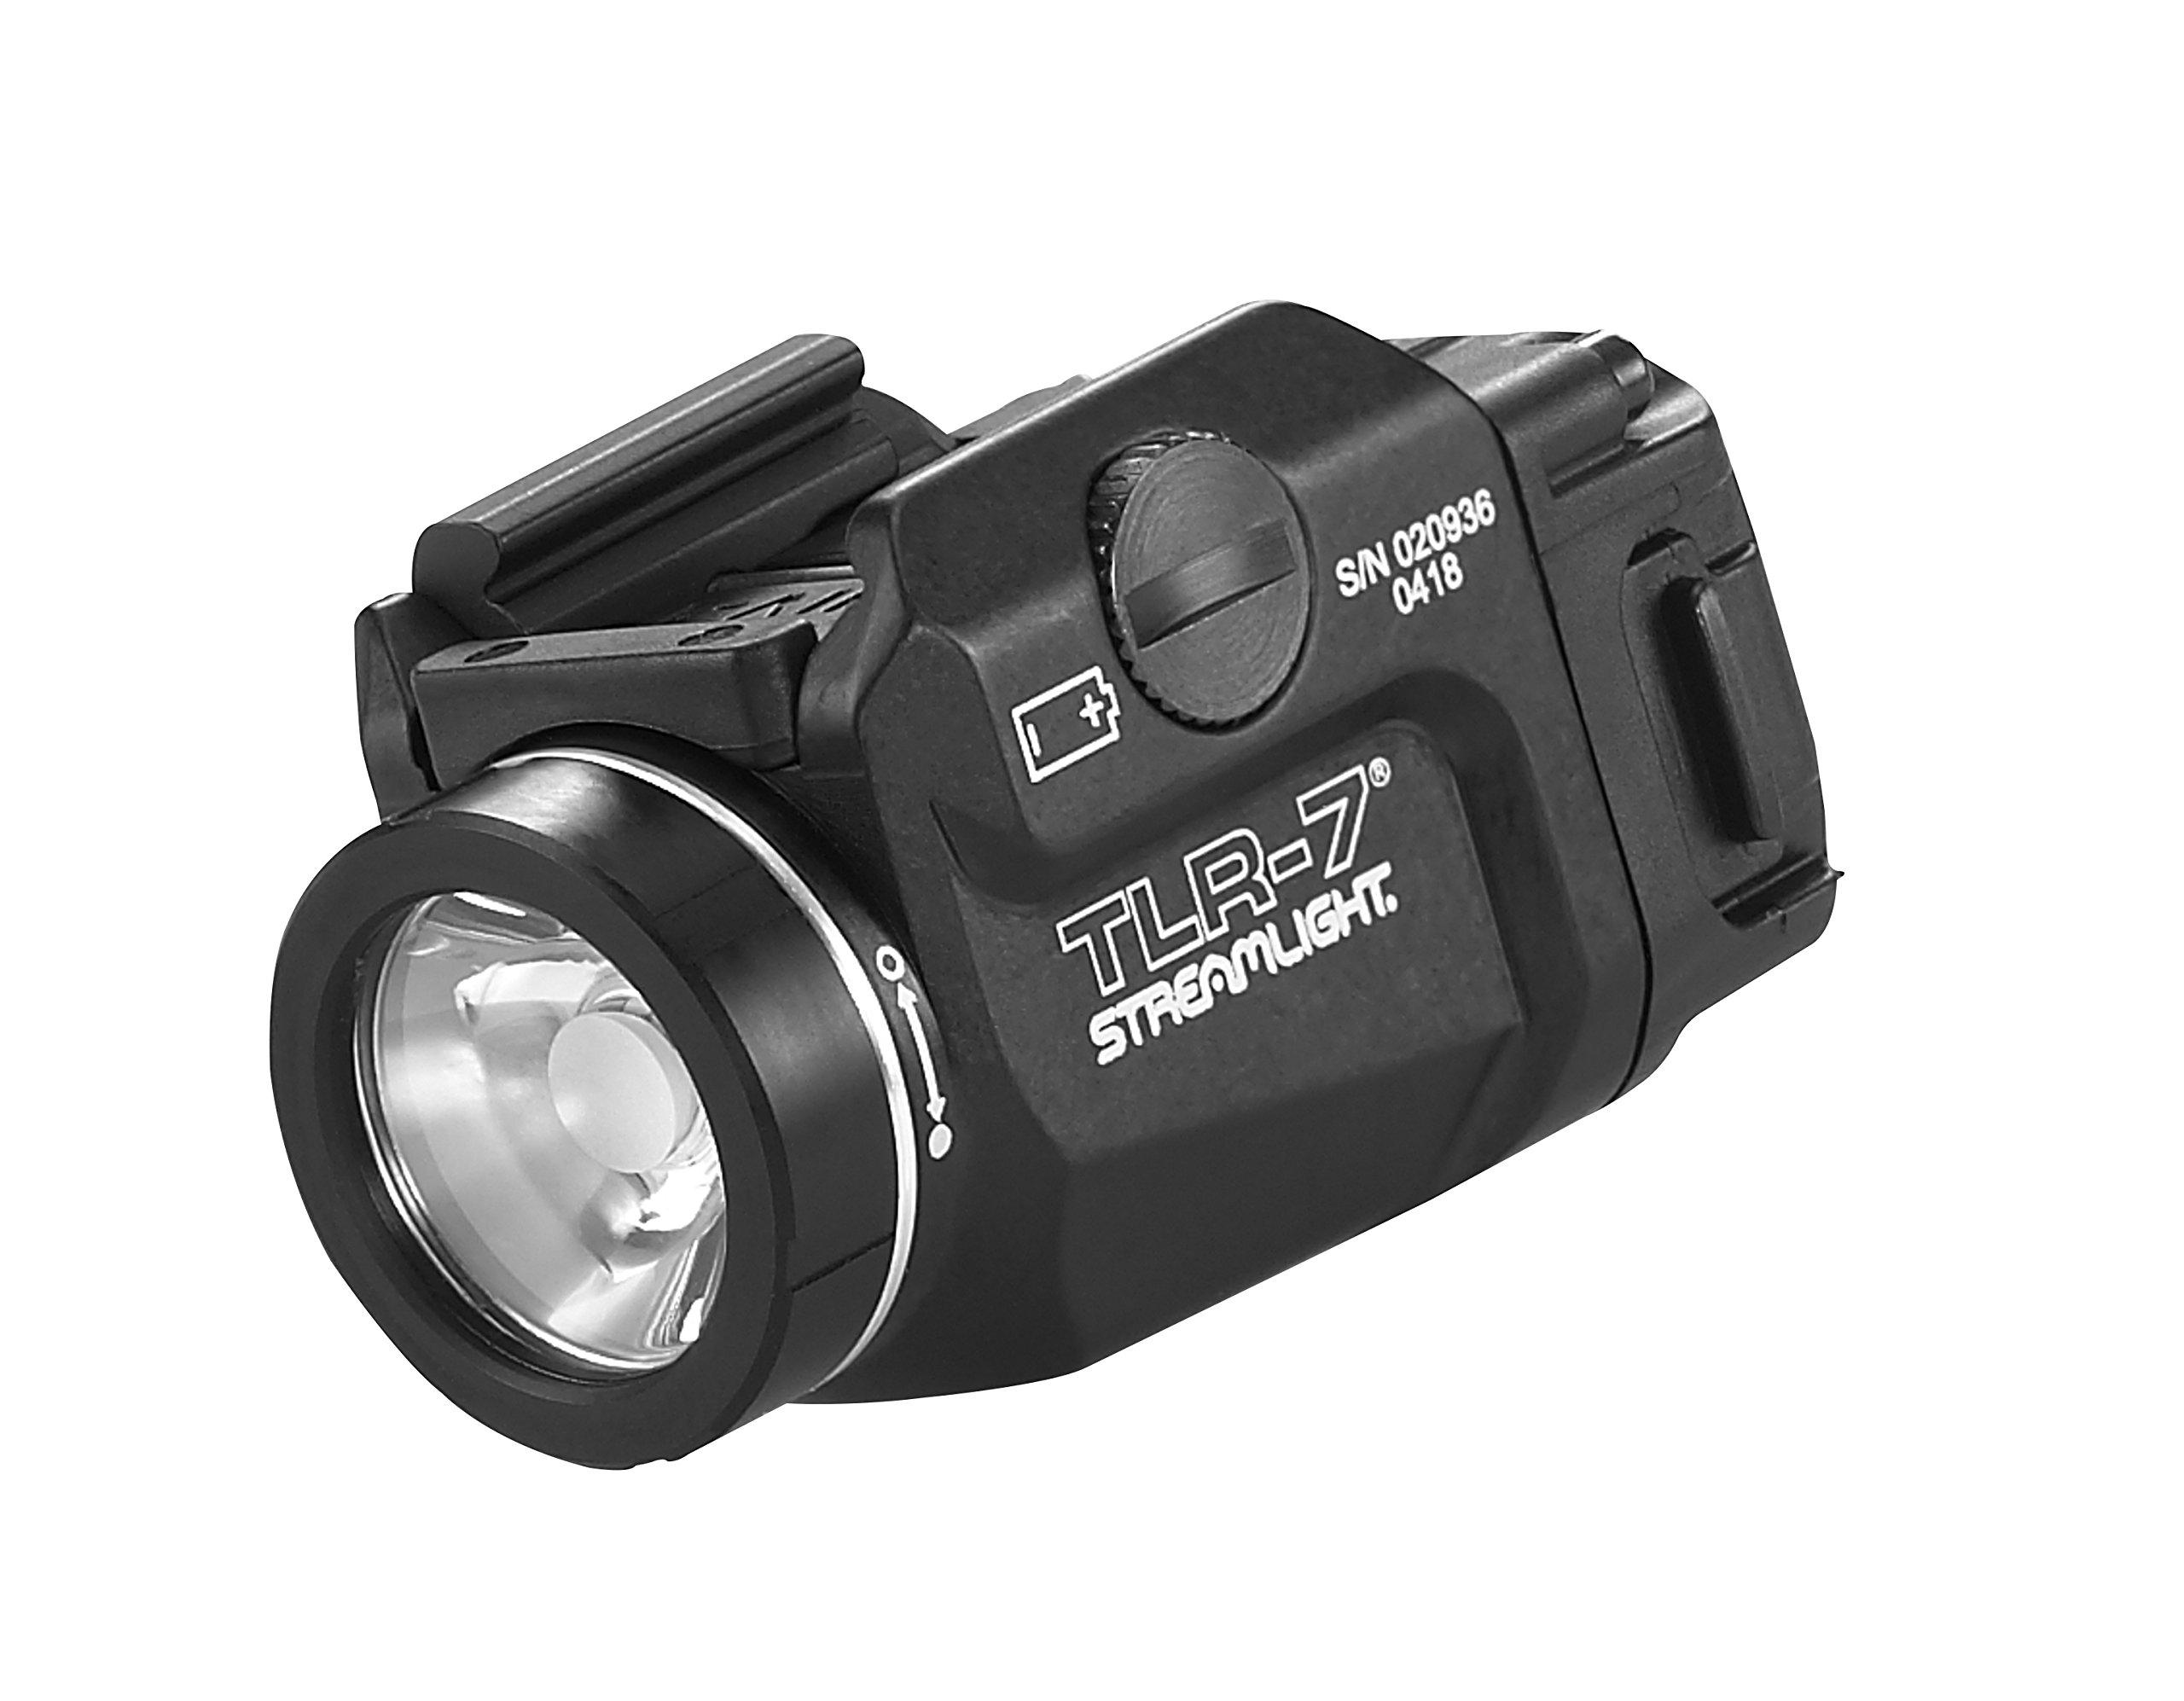 Streamlight 69420 TLR-7 - Rail locating keys, CR123A lithium battery - Box